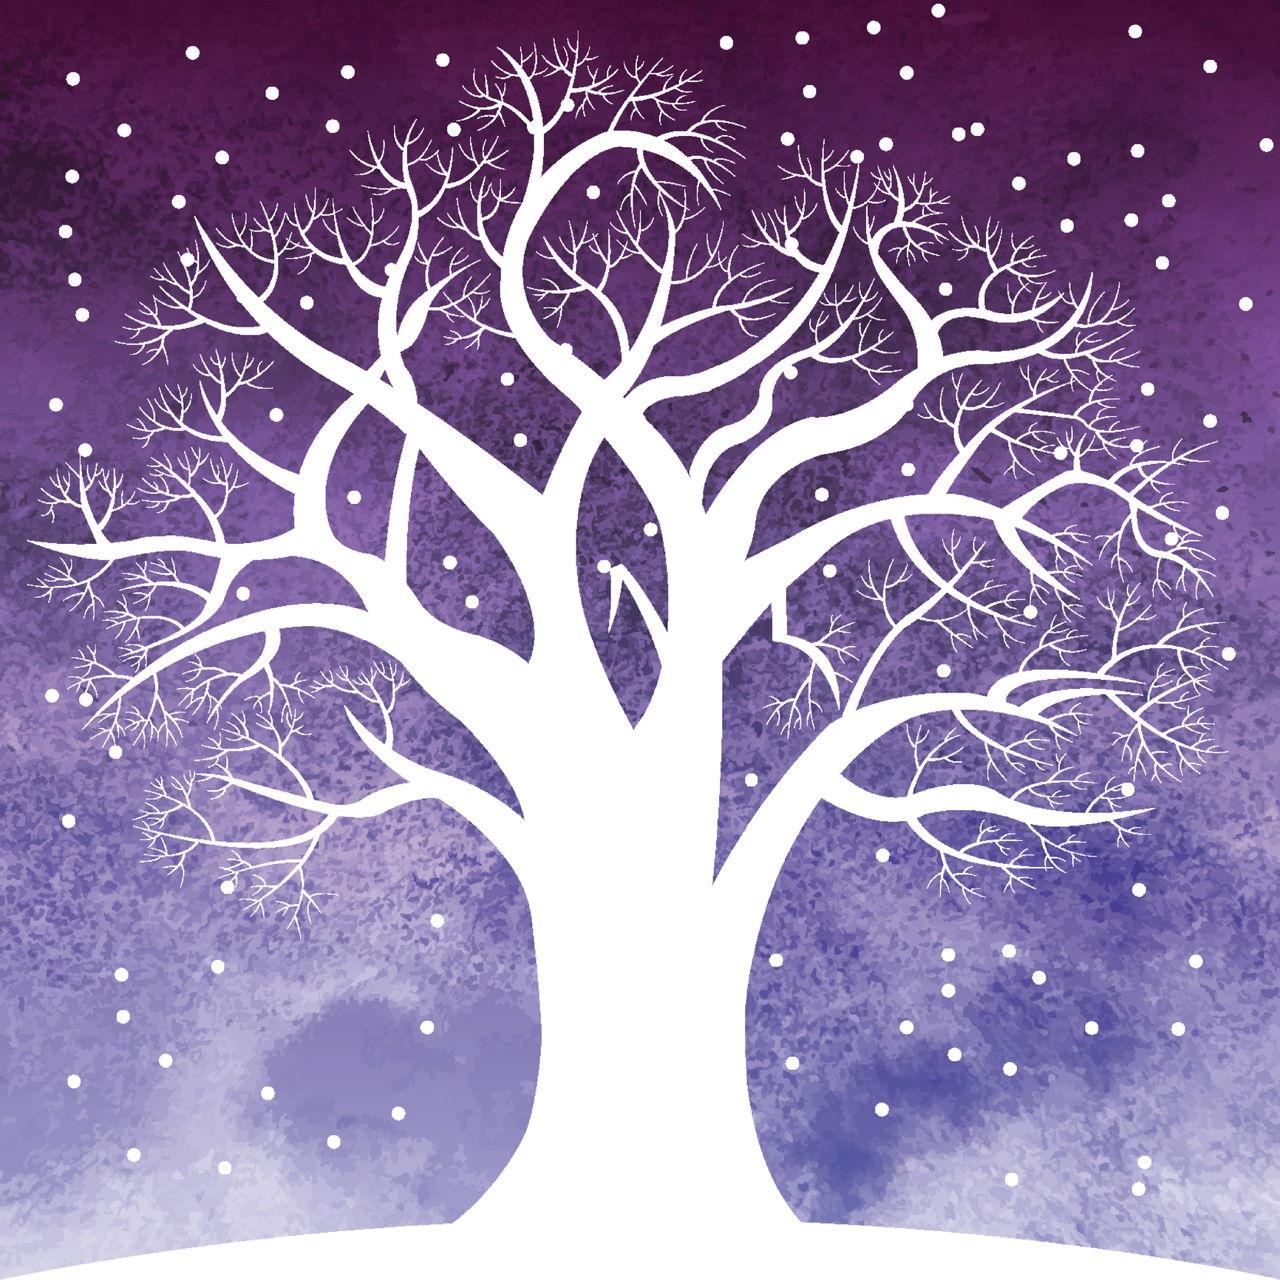 Tree Symbolism